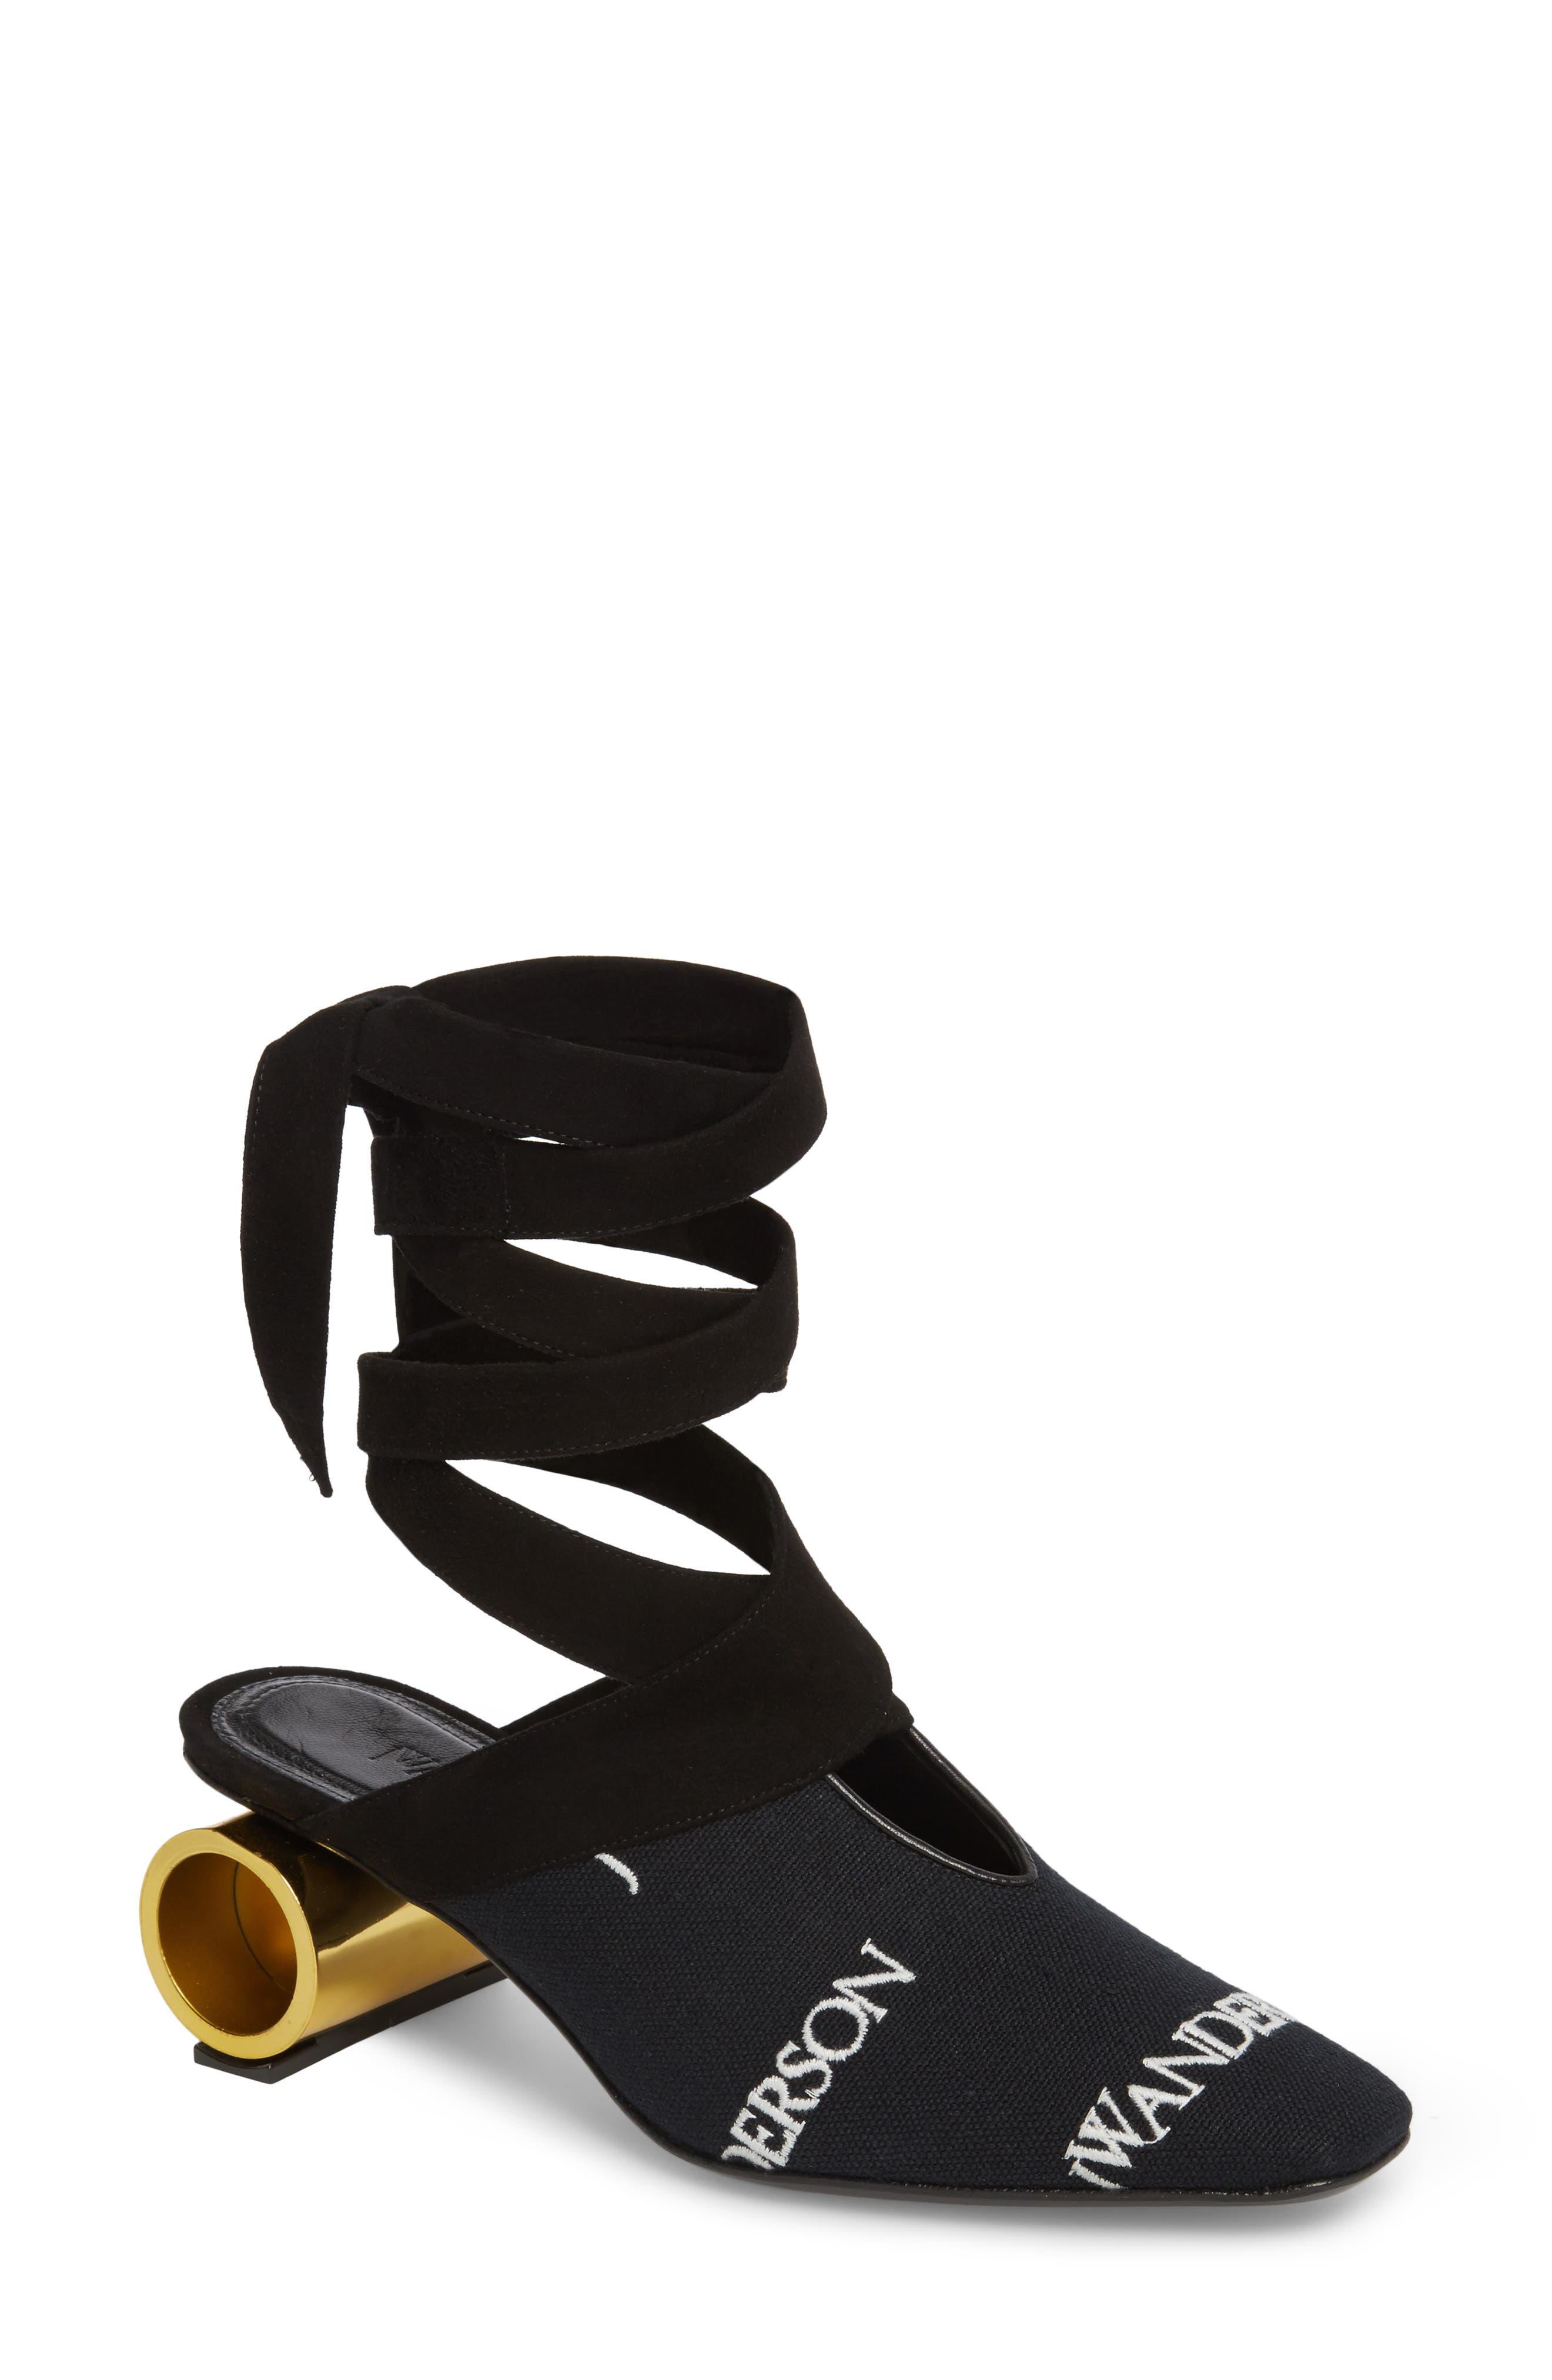 J.W.ANDERSON Cylinder Heel Pump (Women)